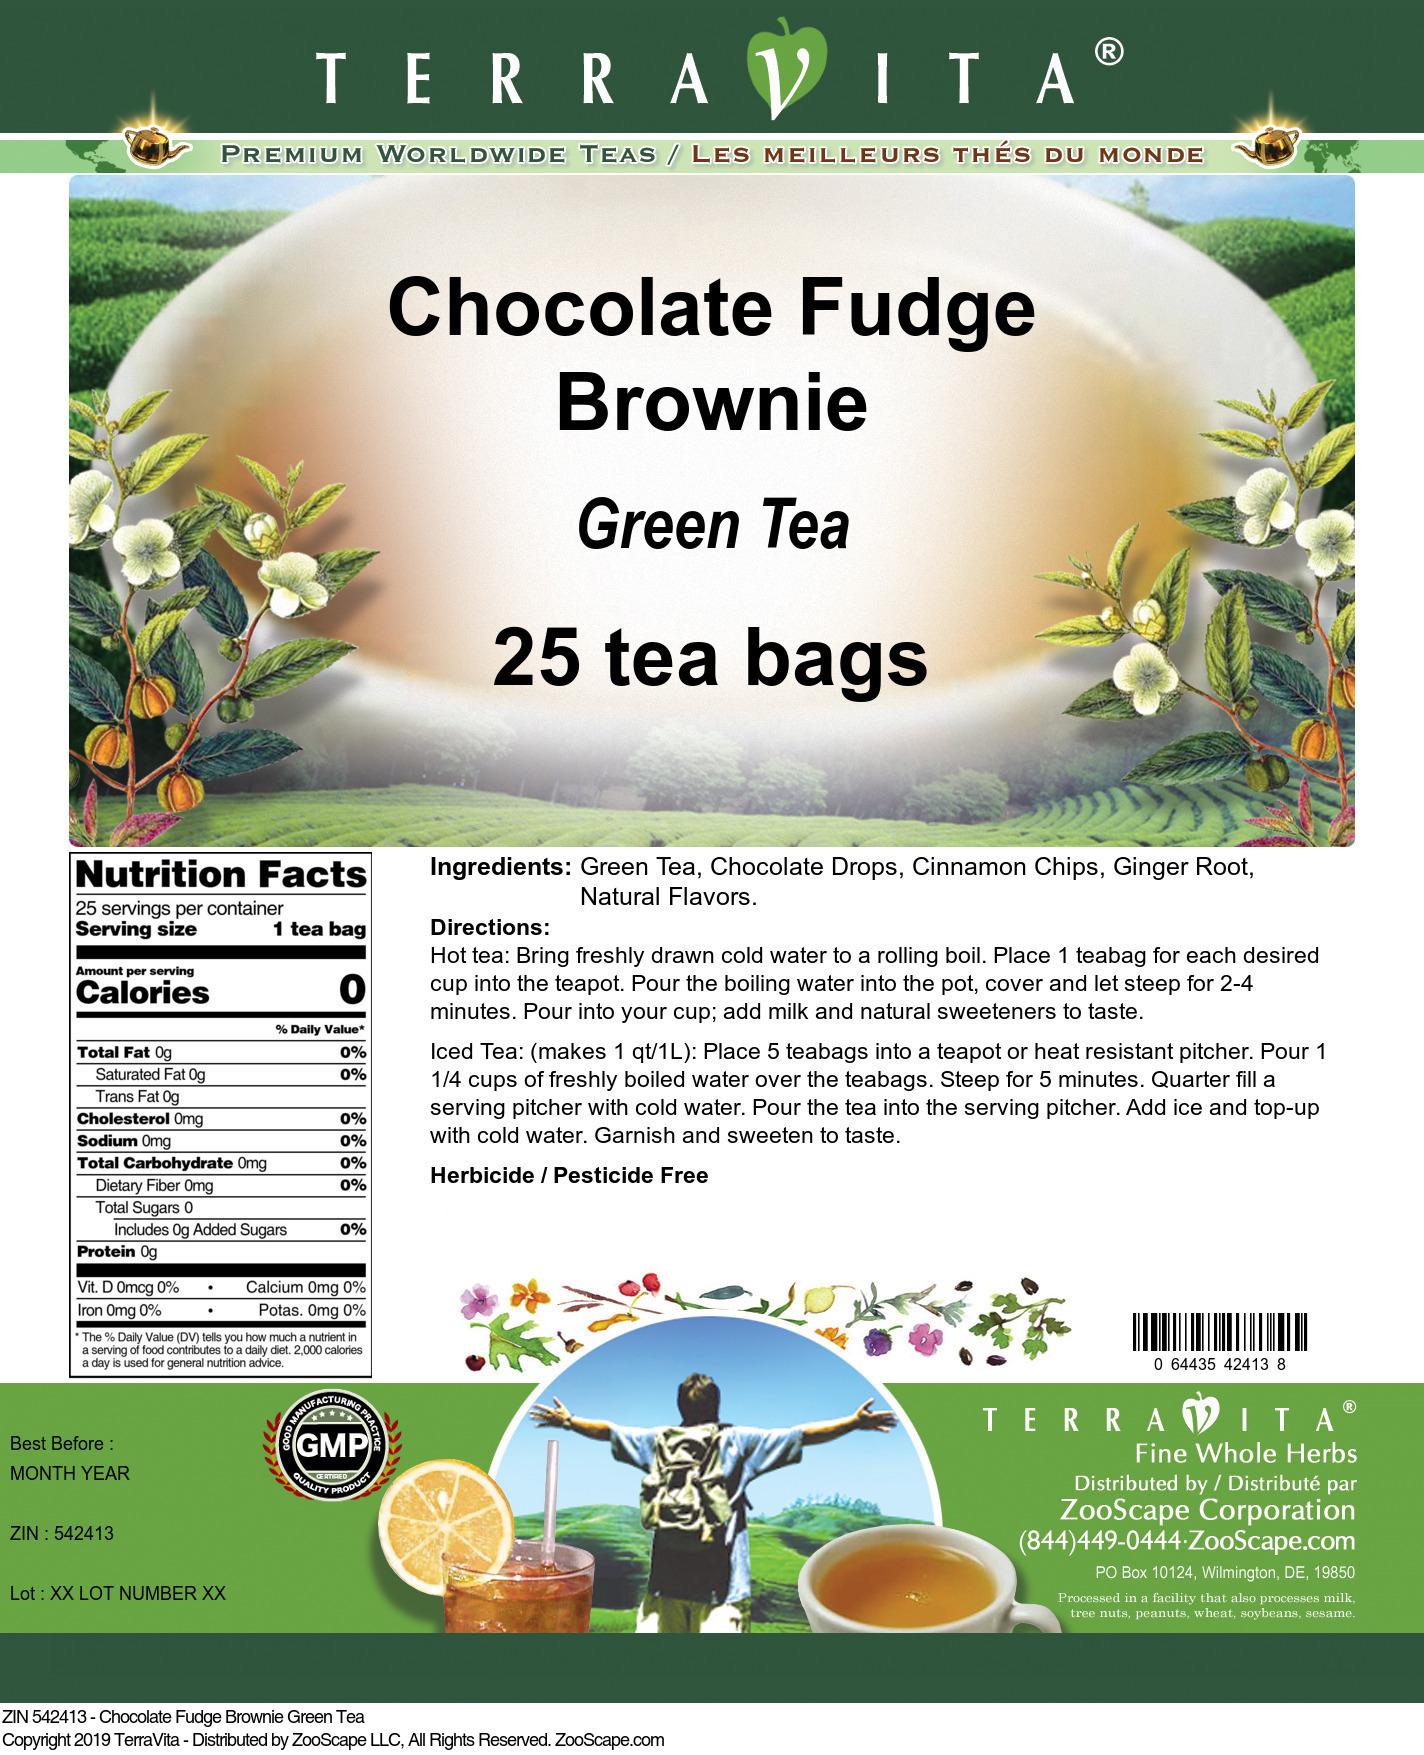 Chocolate Fudge Brownie Green Tea